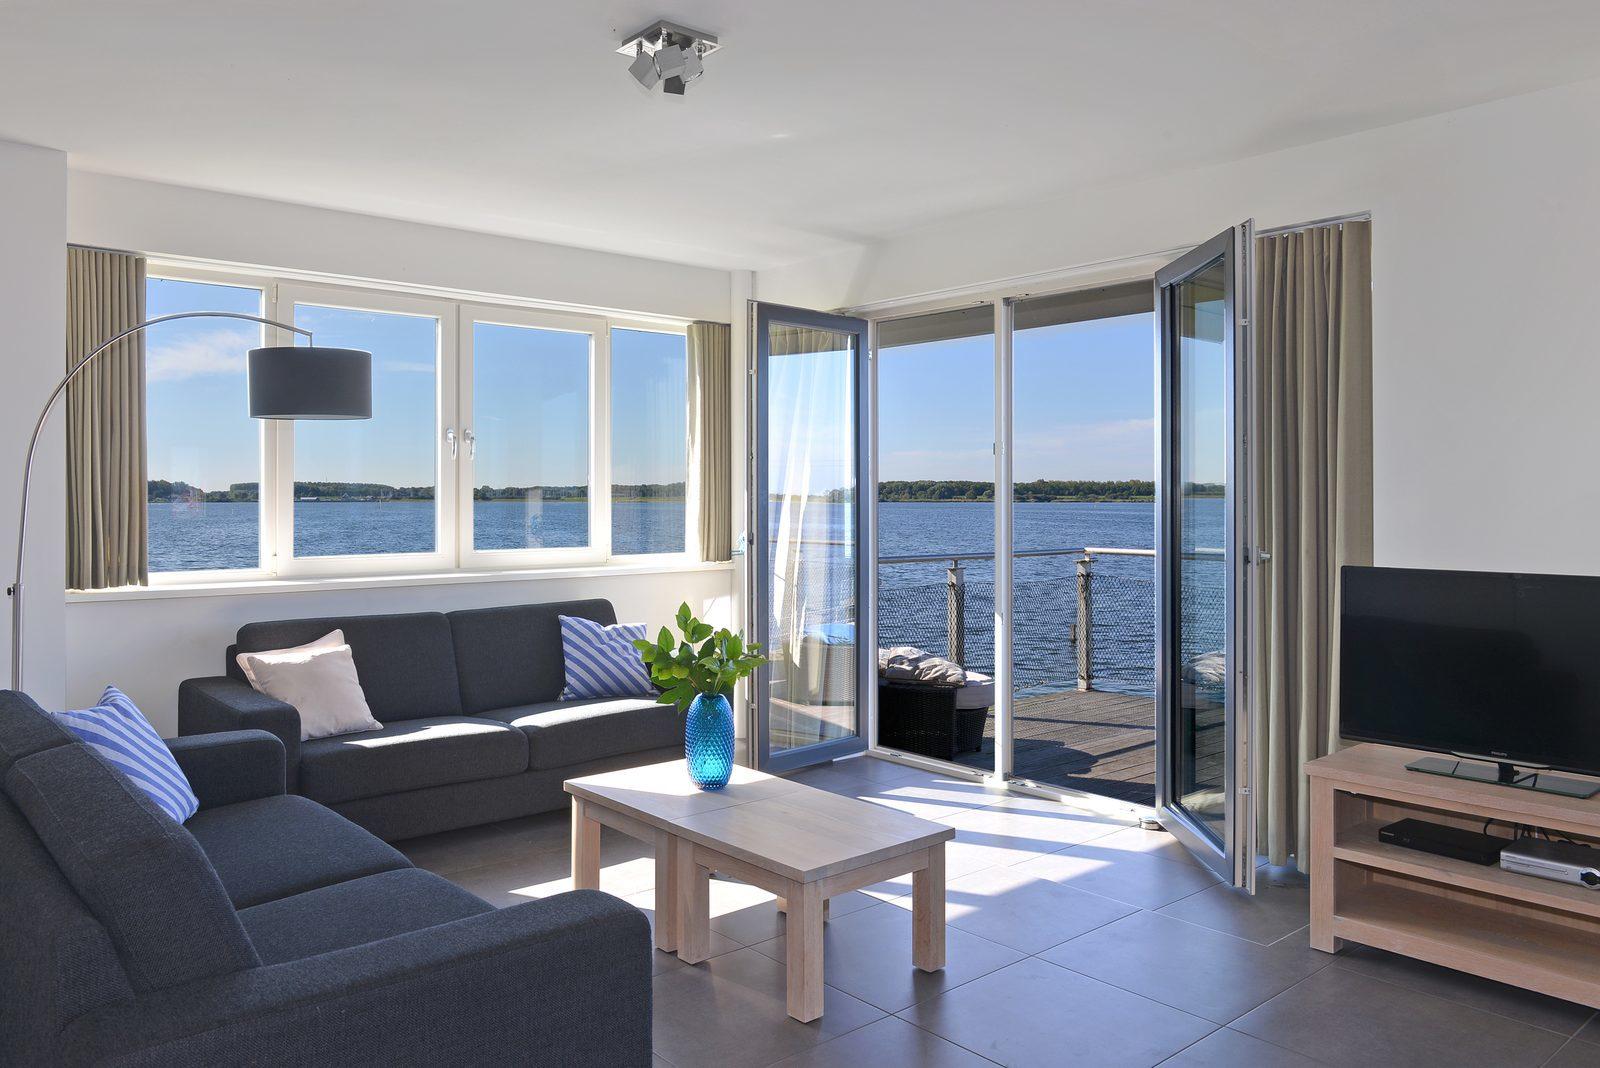 Luxurious group accommodation